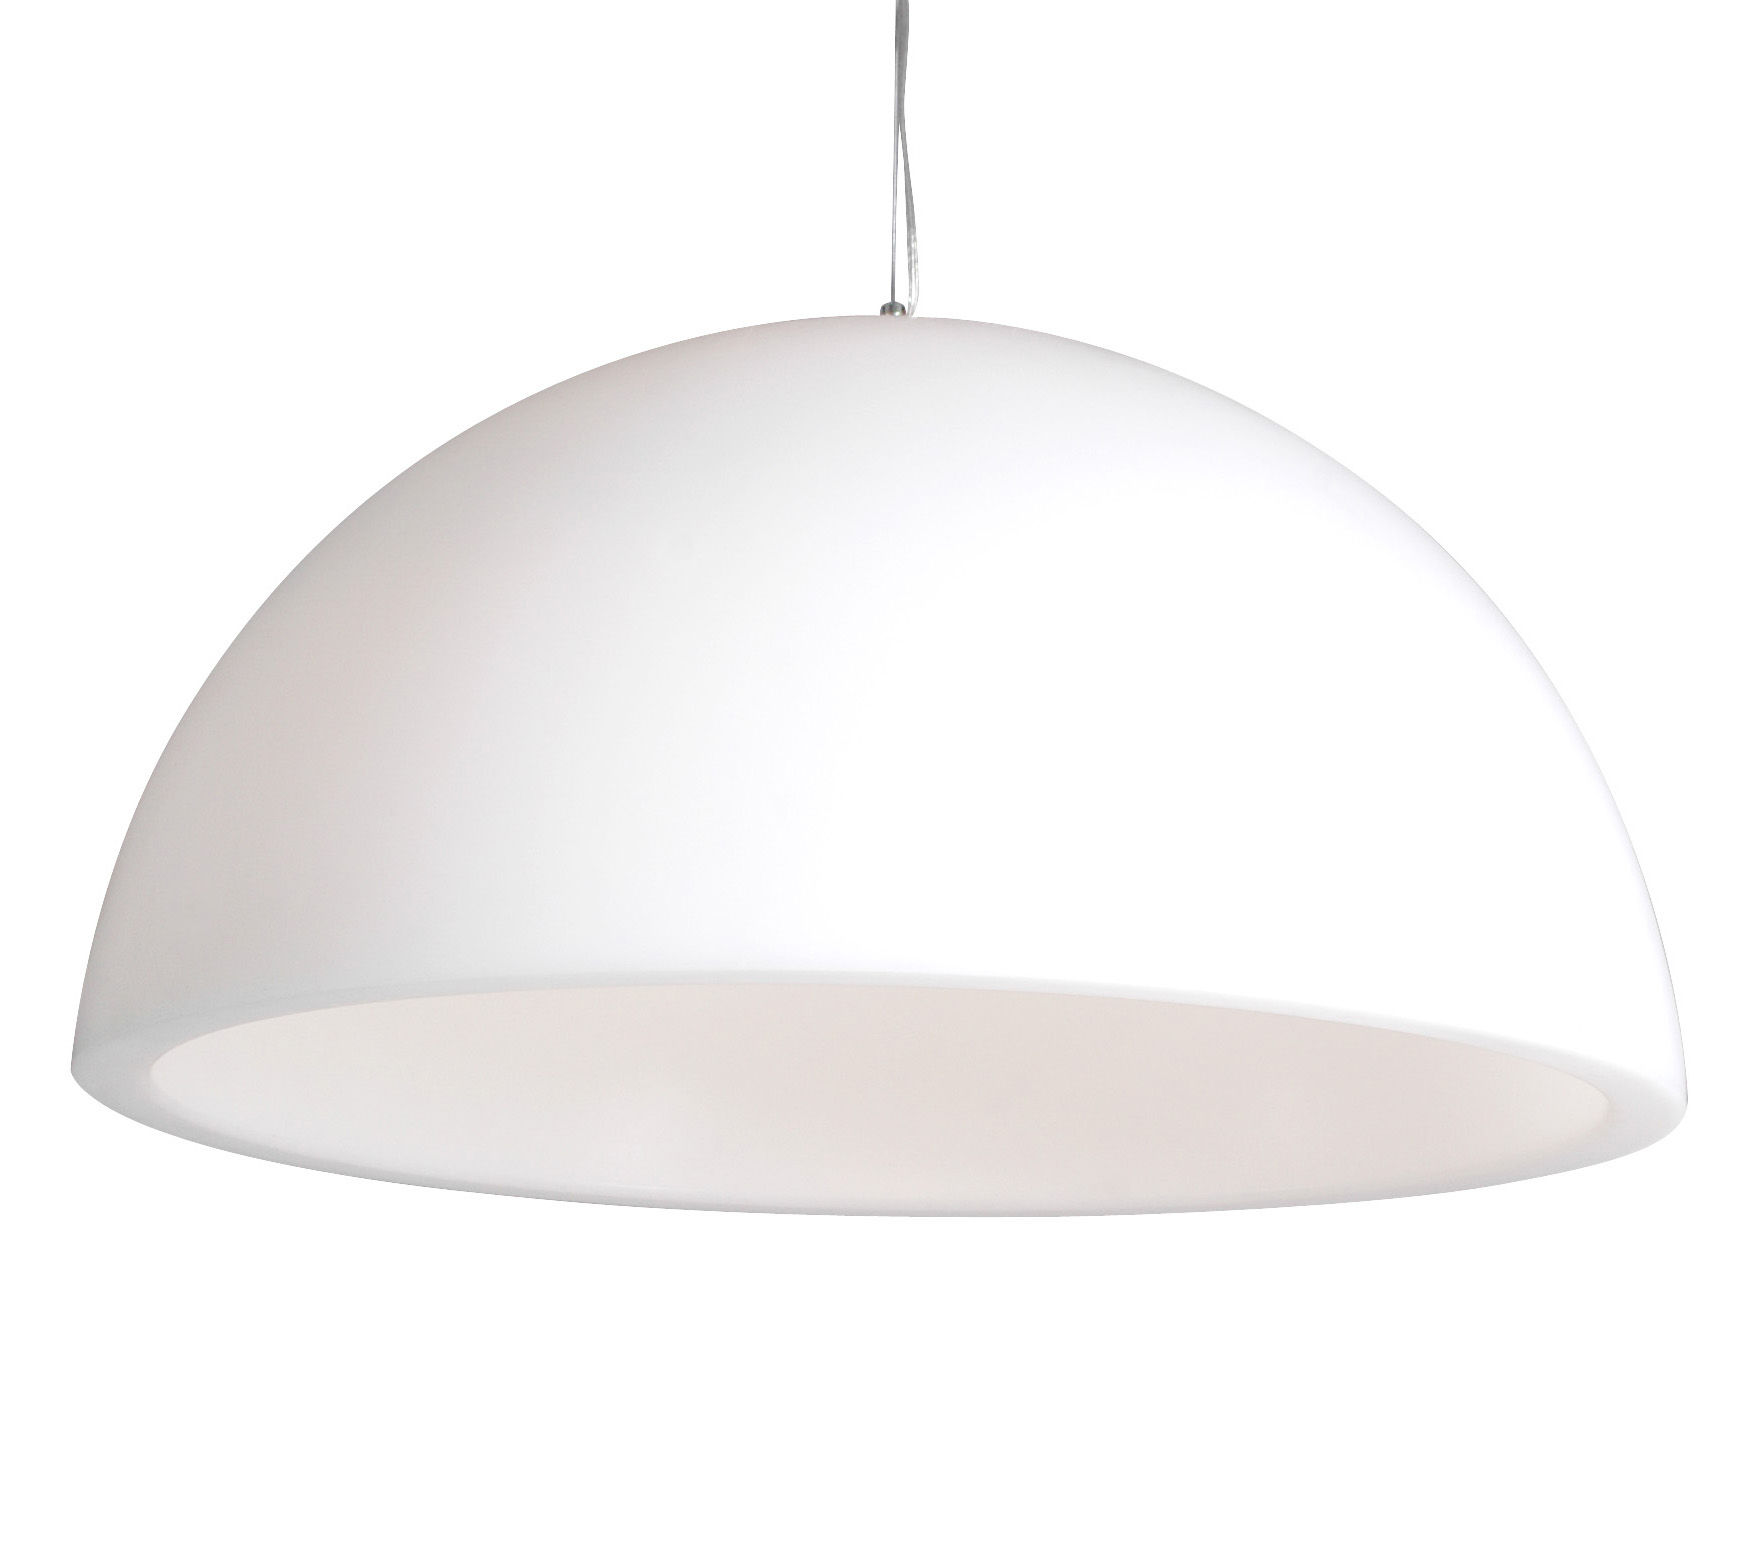 Illuminazione - Lampadari - Sospensione Cupole - Ø 120 cm di Slide - Bianco - polietilene riciclabile